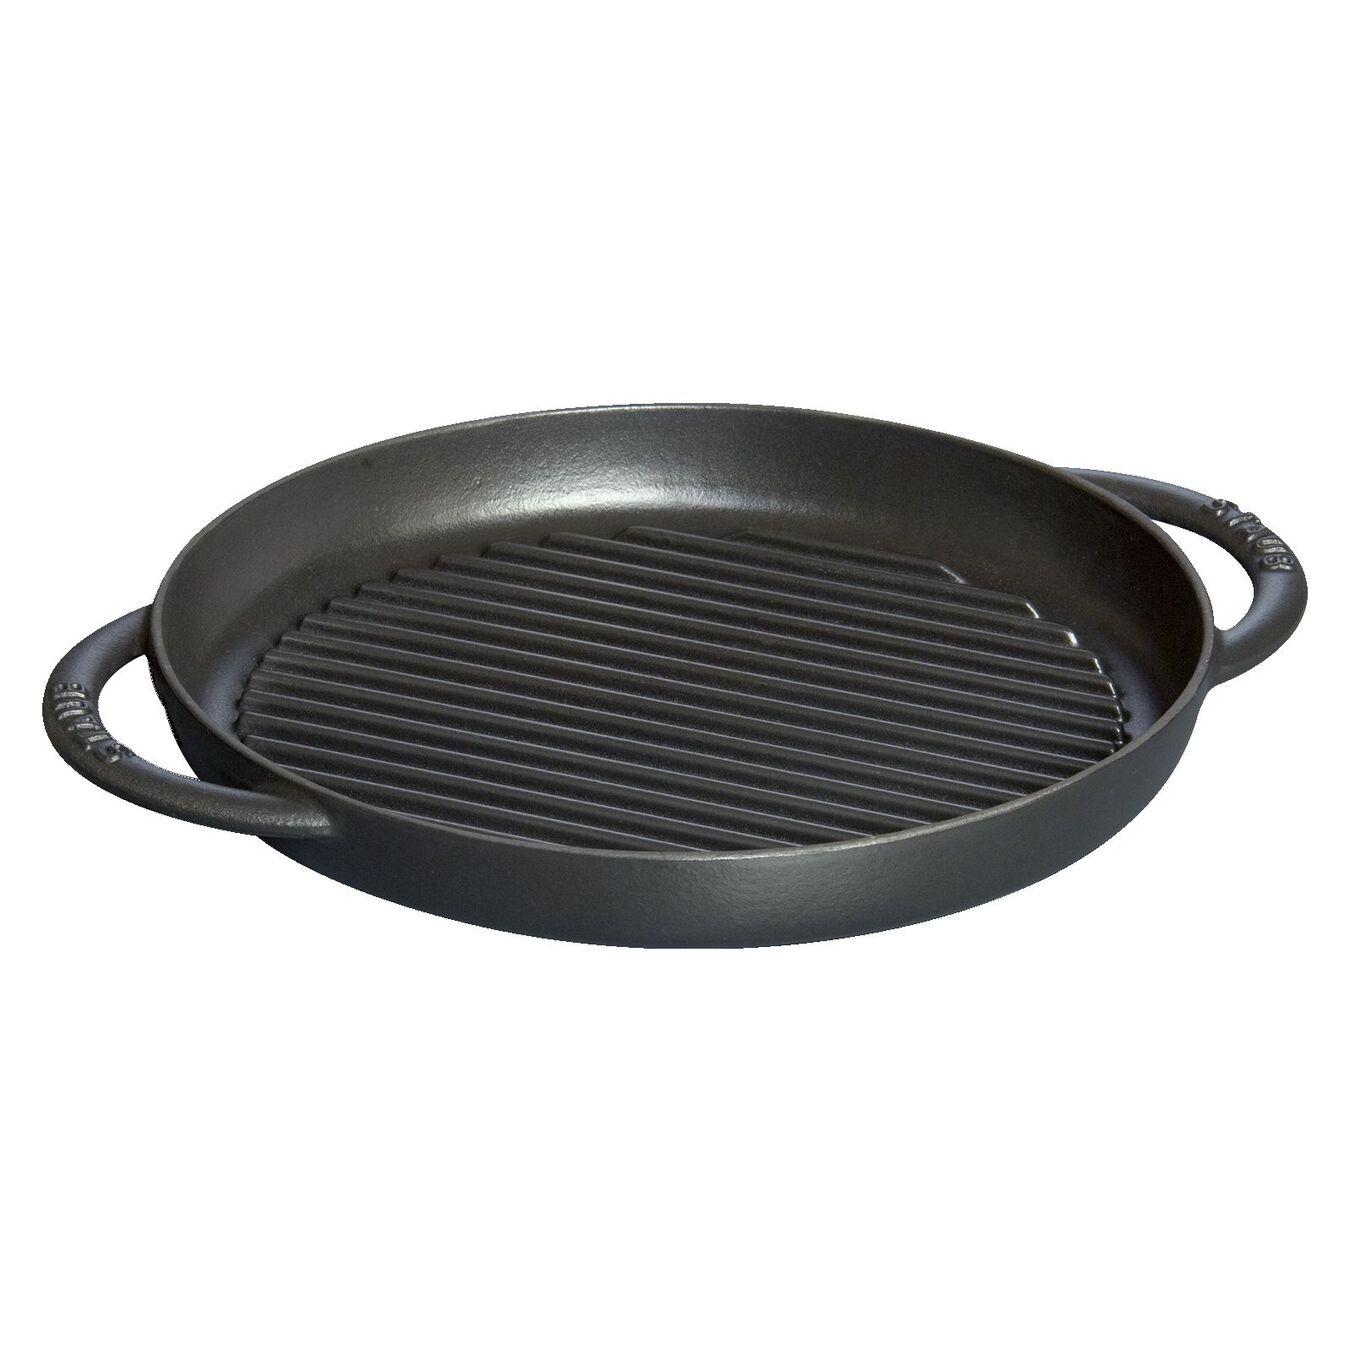 Pure grill 26 cm, Rund, Sort, Støbejern,,large 1